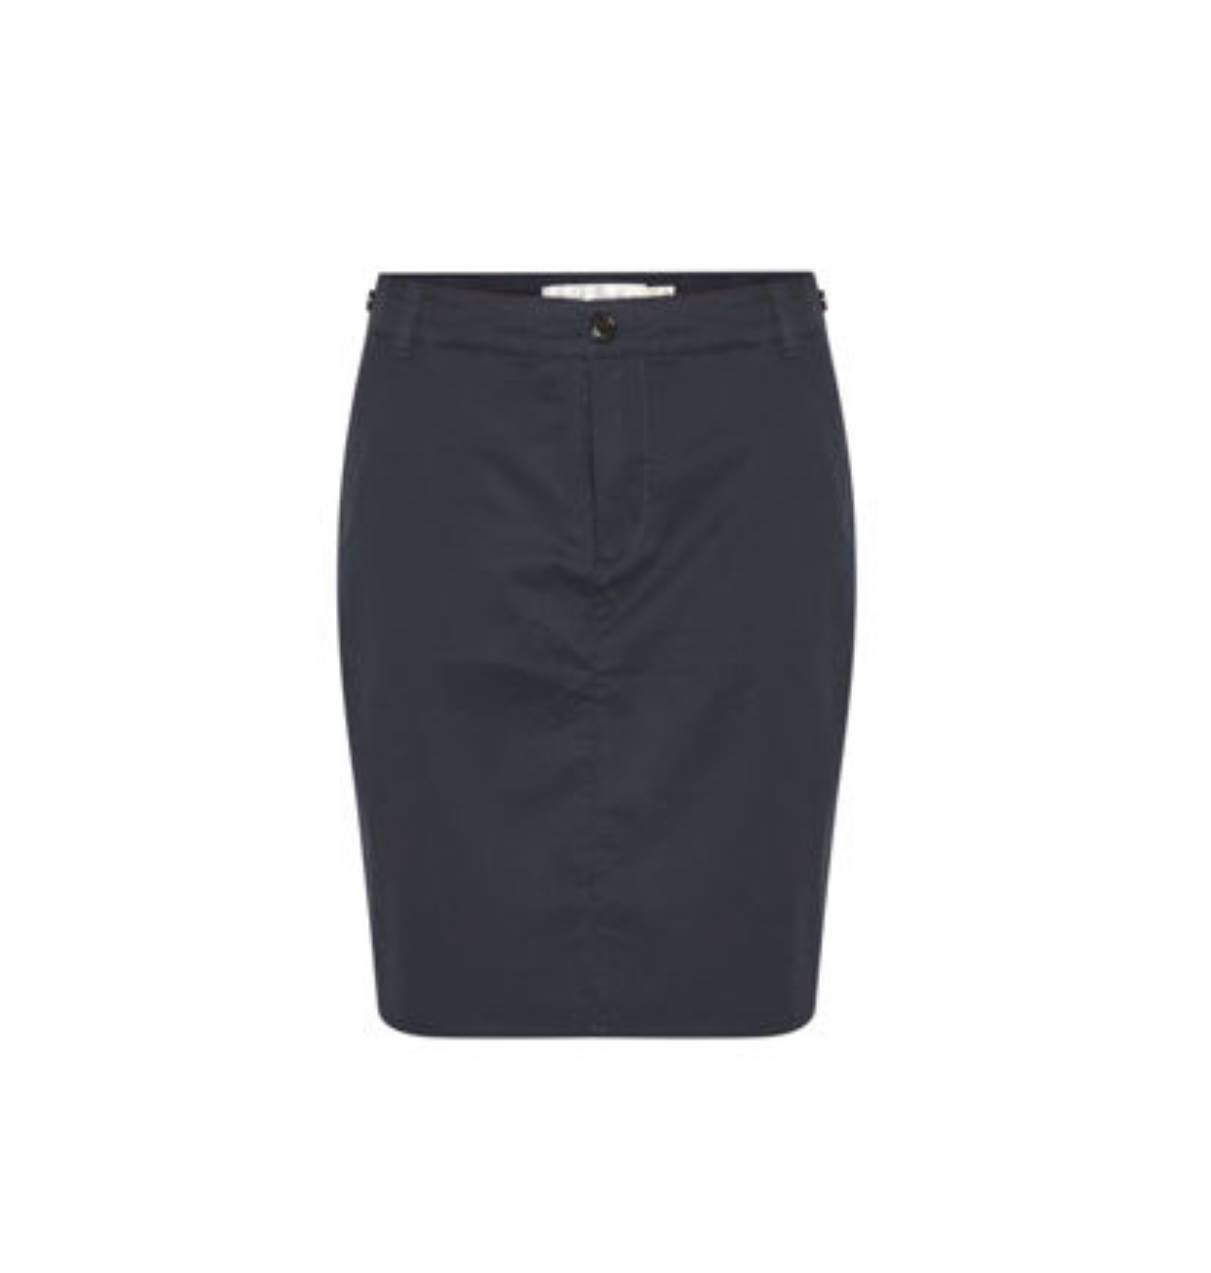 BirtalW Skirt - Marine Blue